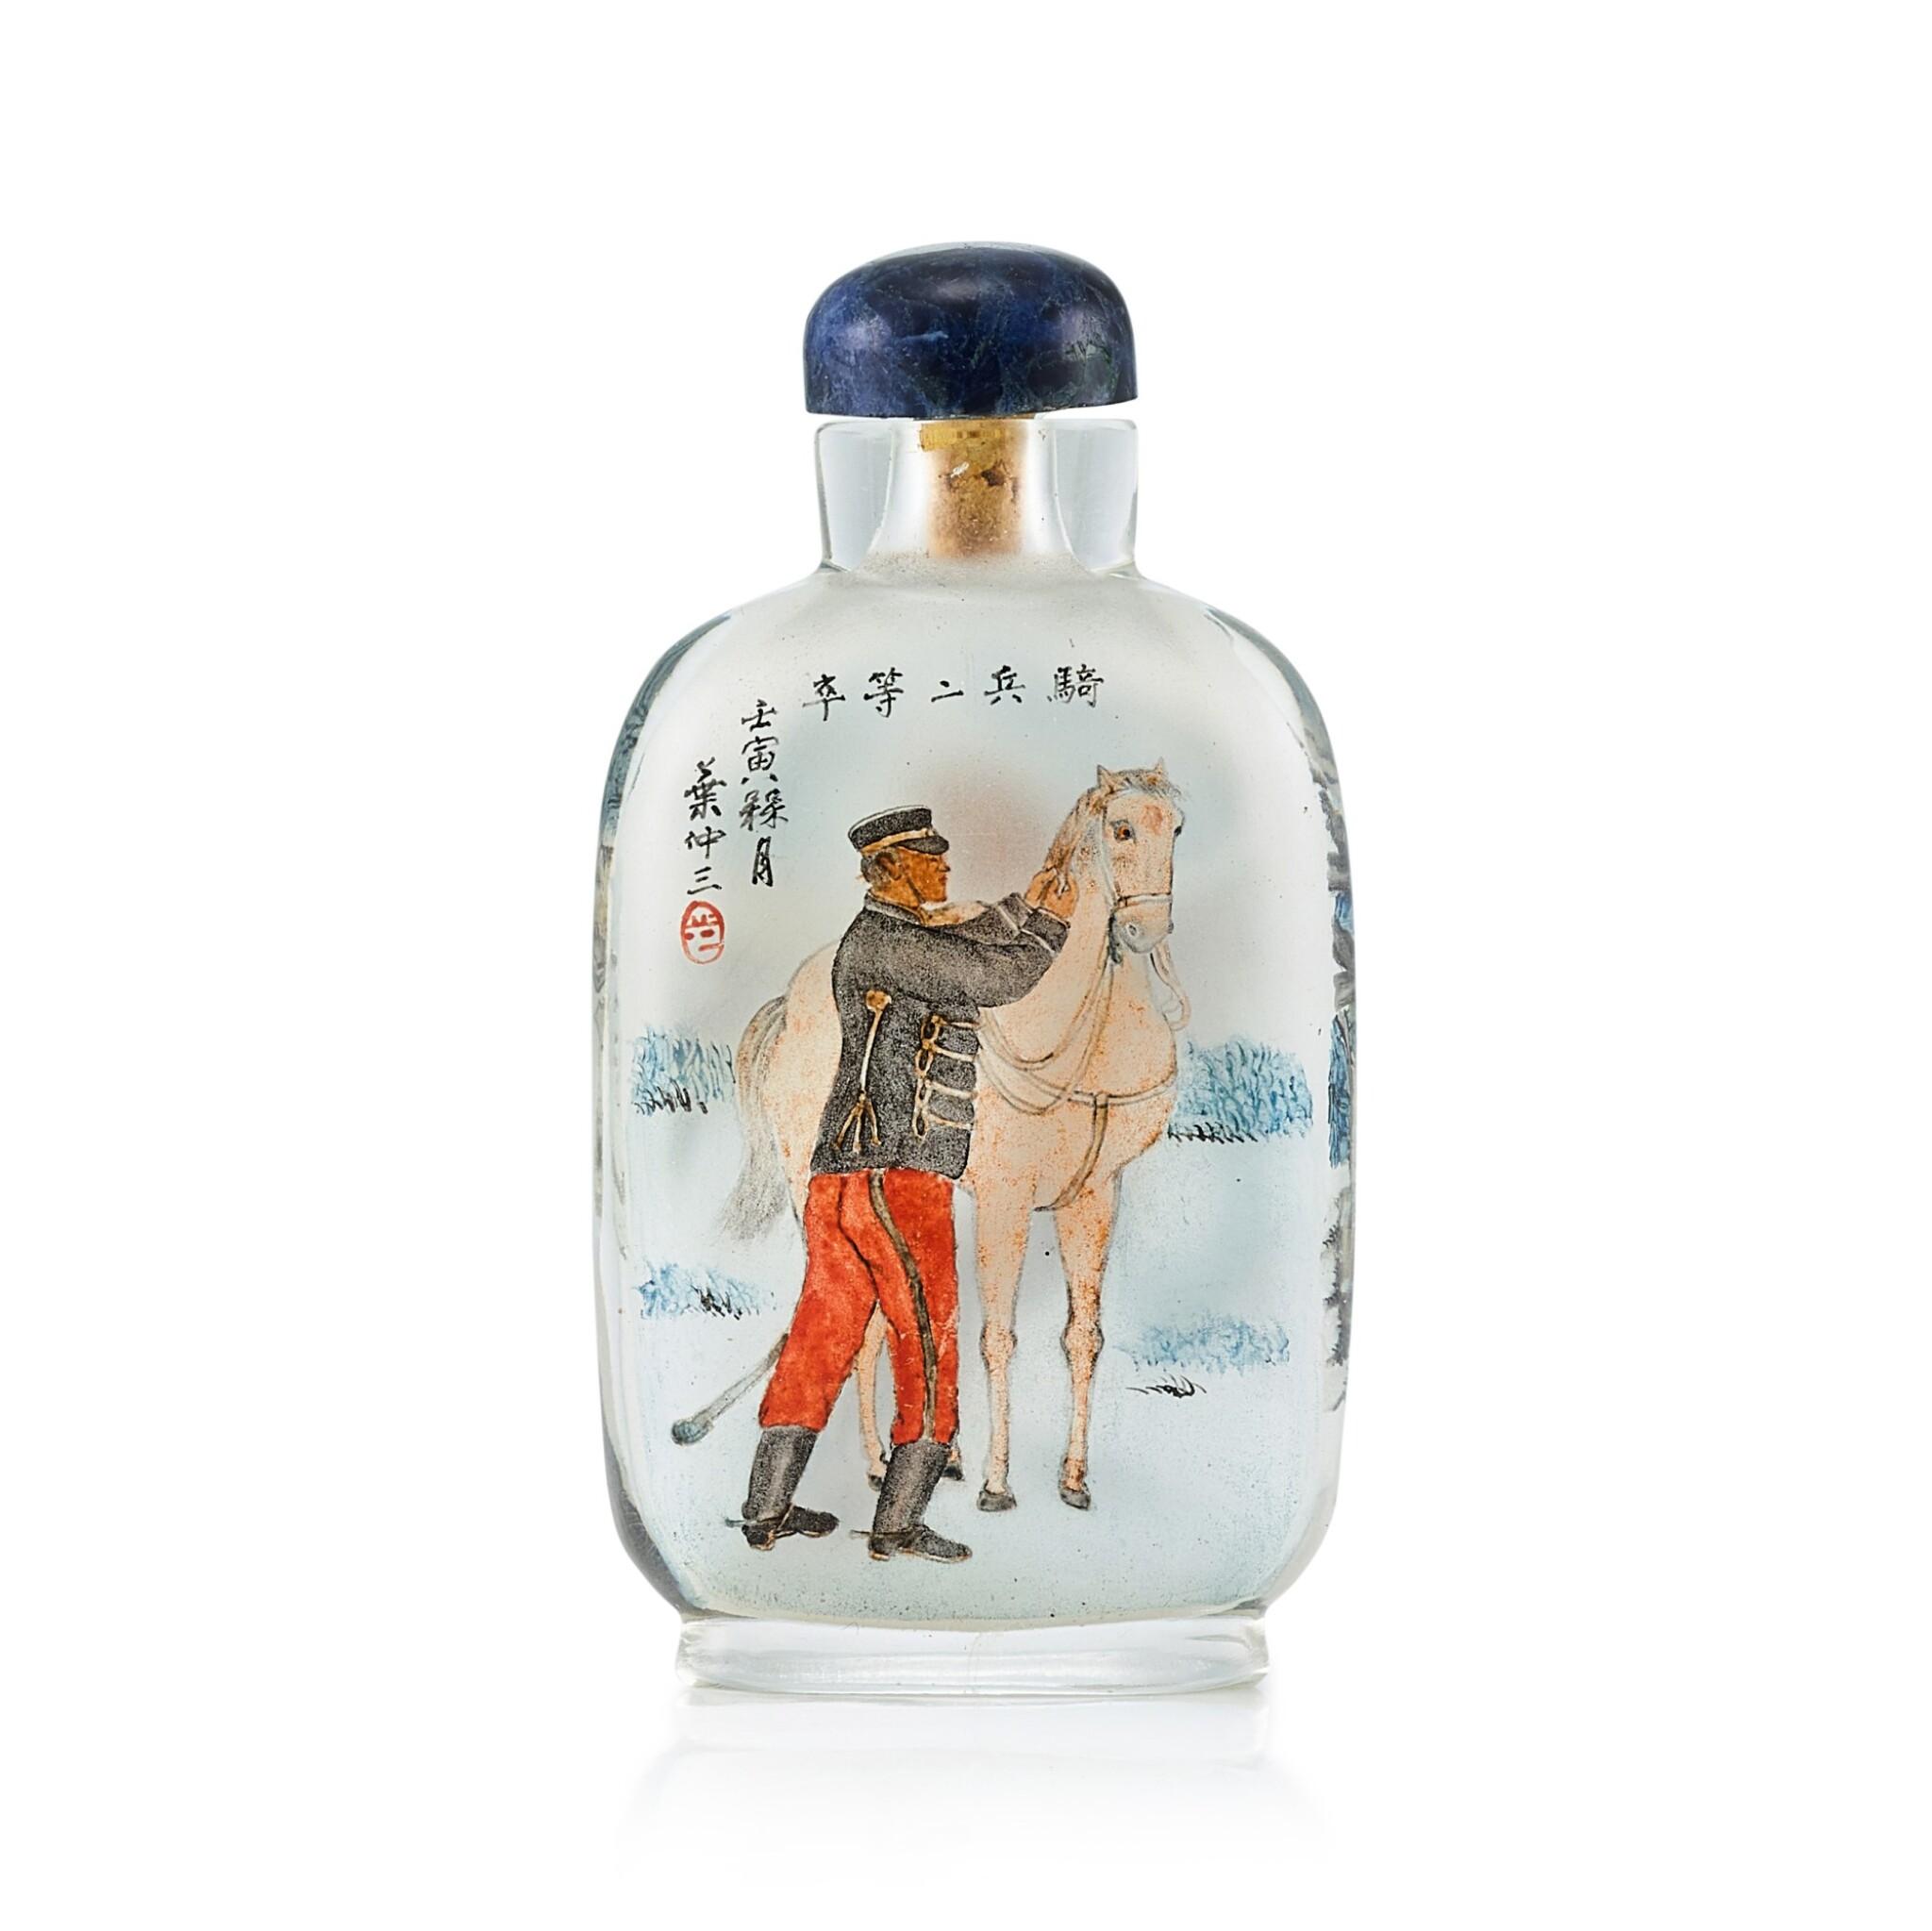 View full screen - View 1 of Lot 3014. An Inside-Painted 'European Soldier and Liu Hai' Glass Snuff Bottle By Ye Zhongsan, Dated Renyin Year, Corresponding to 1902 | 壬寅(1902年) 葉仲三作玻璃內畫「騎兵二等卒」及劉海鼻煙壺 《壬寅秋月葉仲三》款.